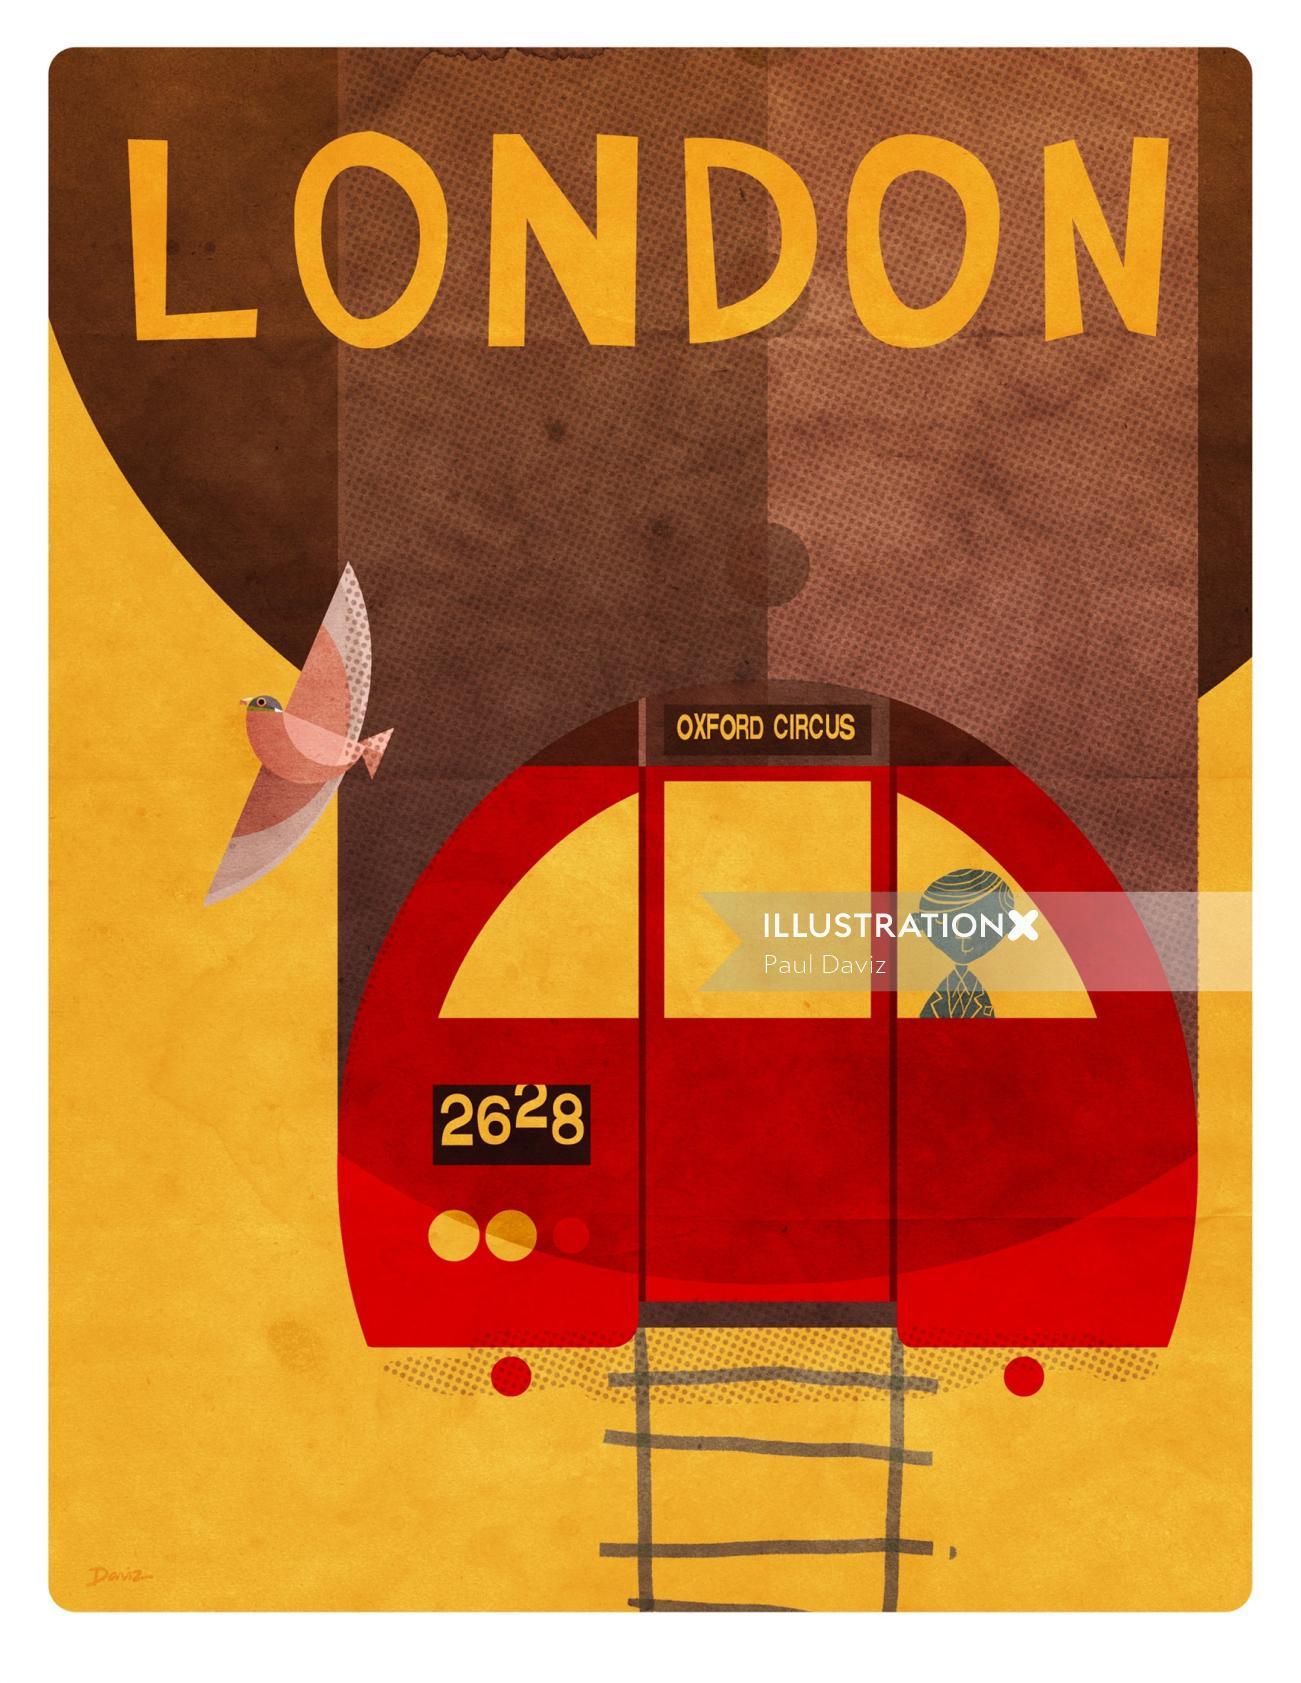 Souvenir of London Metro Poster for Daviz Industries